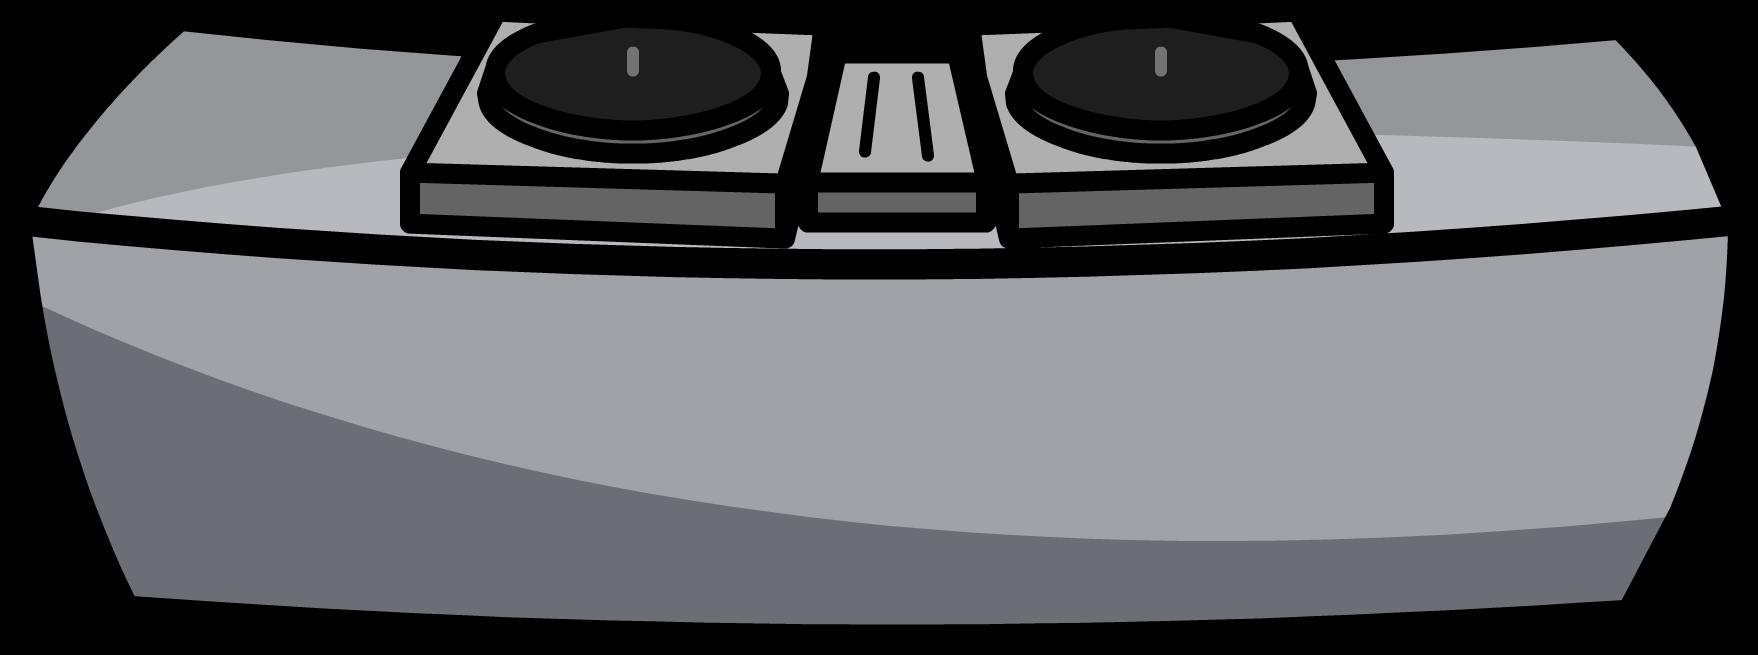 jpg black and white stock dj transparent club #93422481